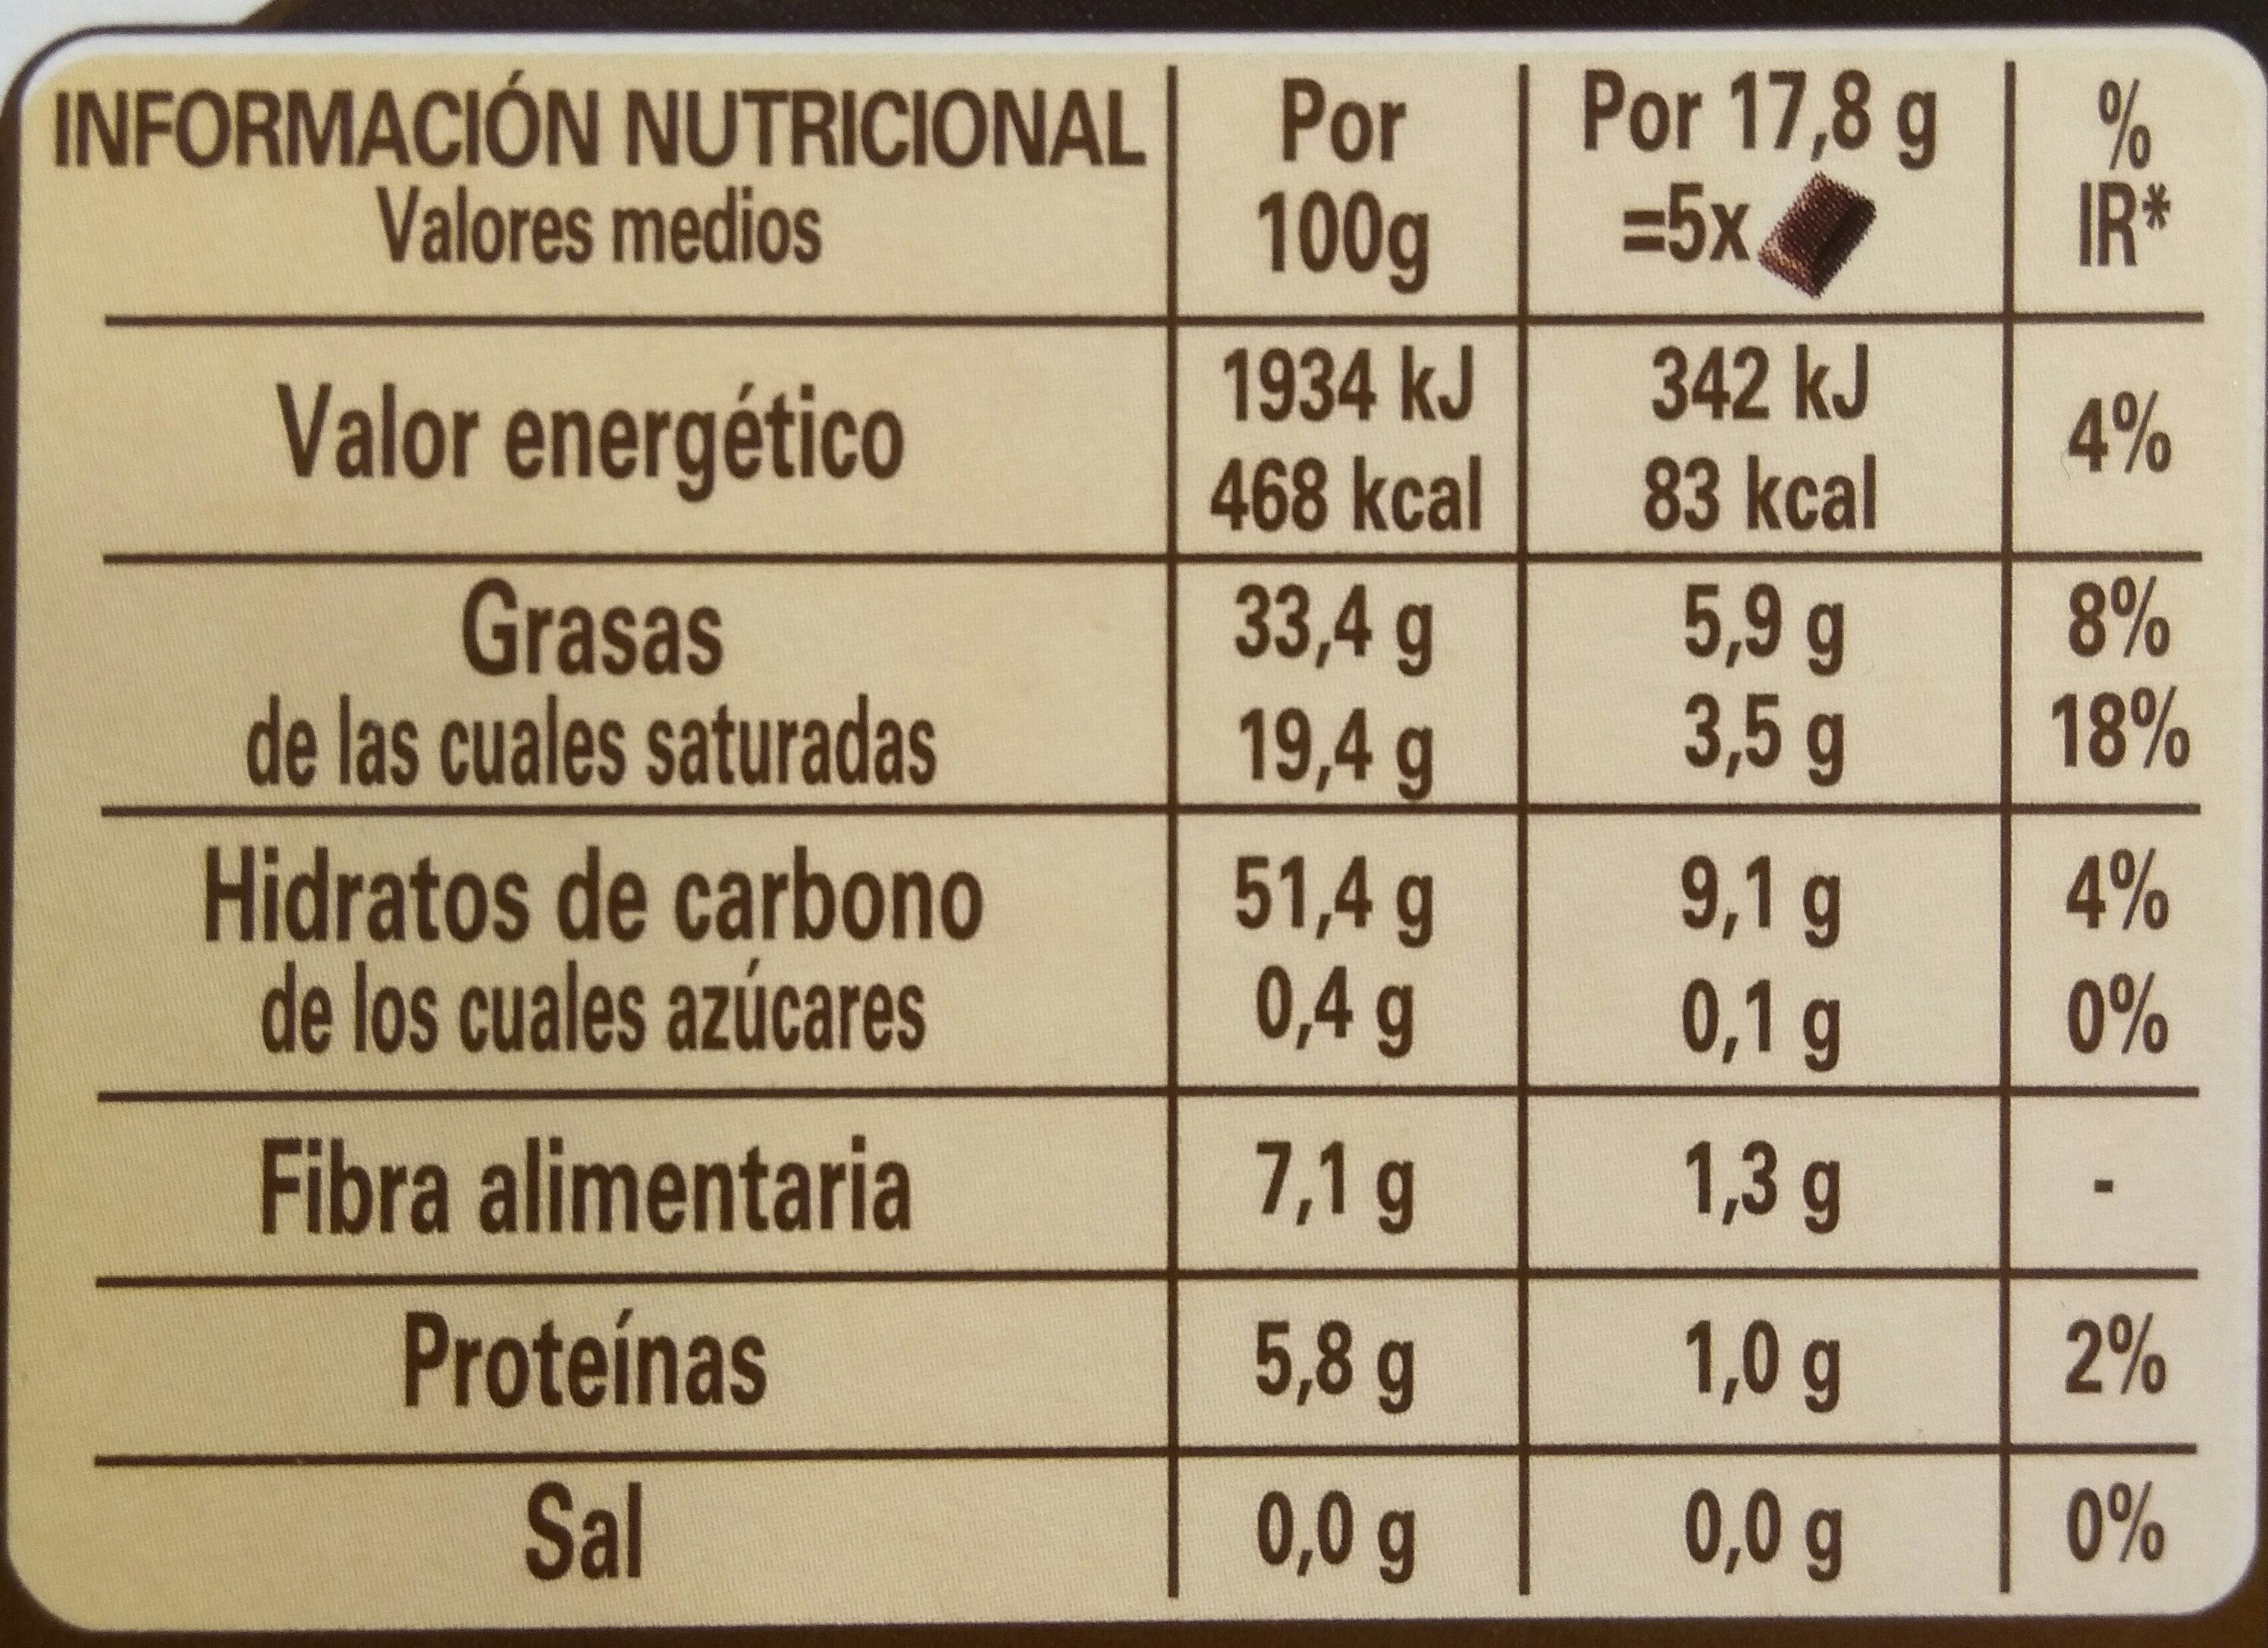 Chocolate Nestlé Negro Sin Azúcar - Informació nutricional